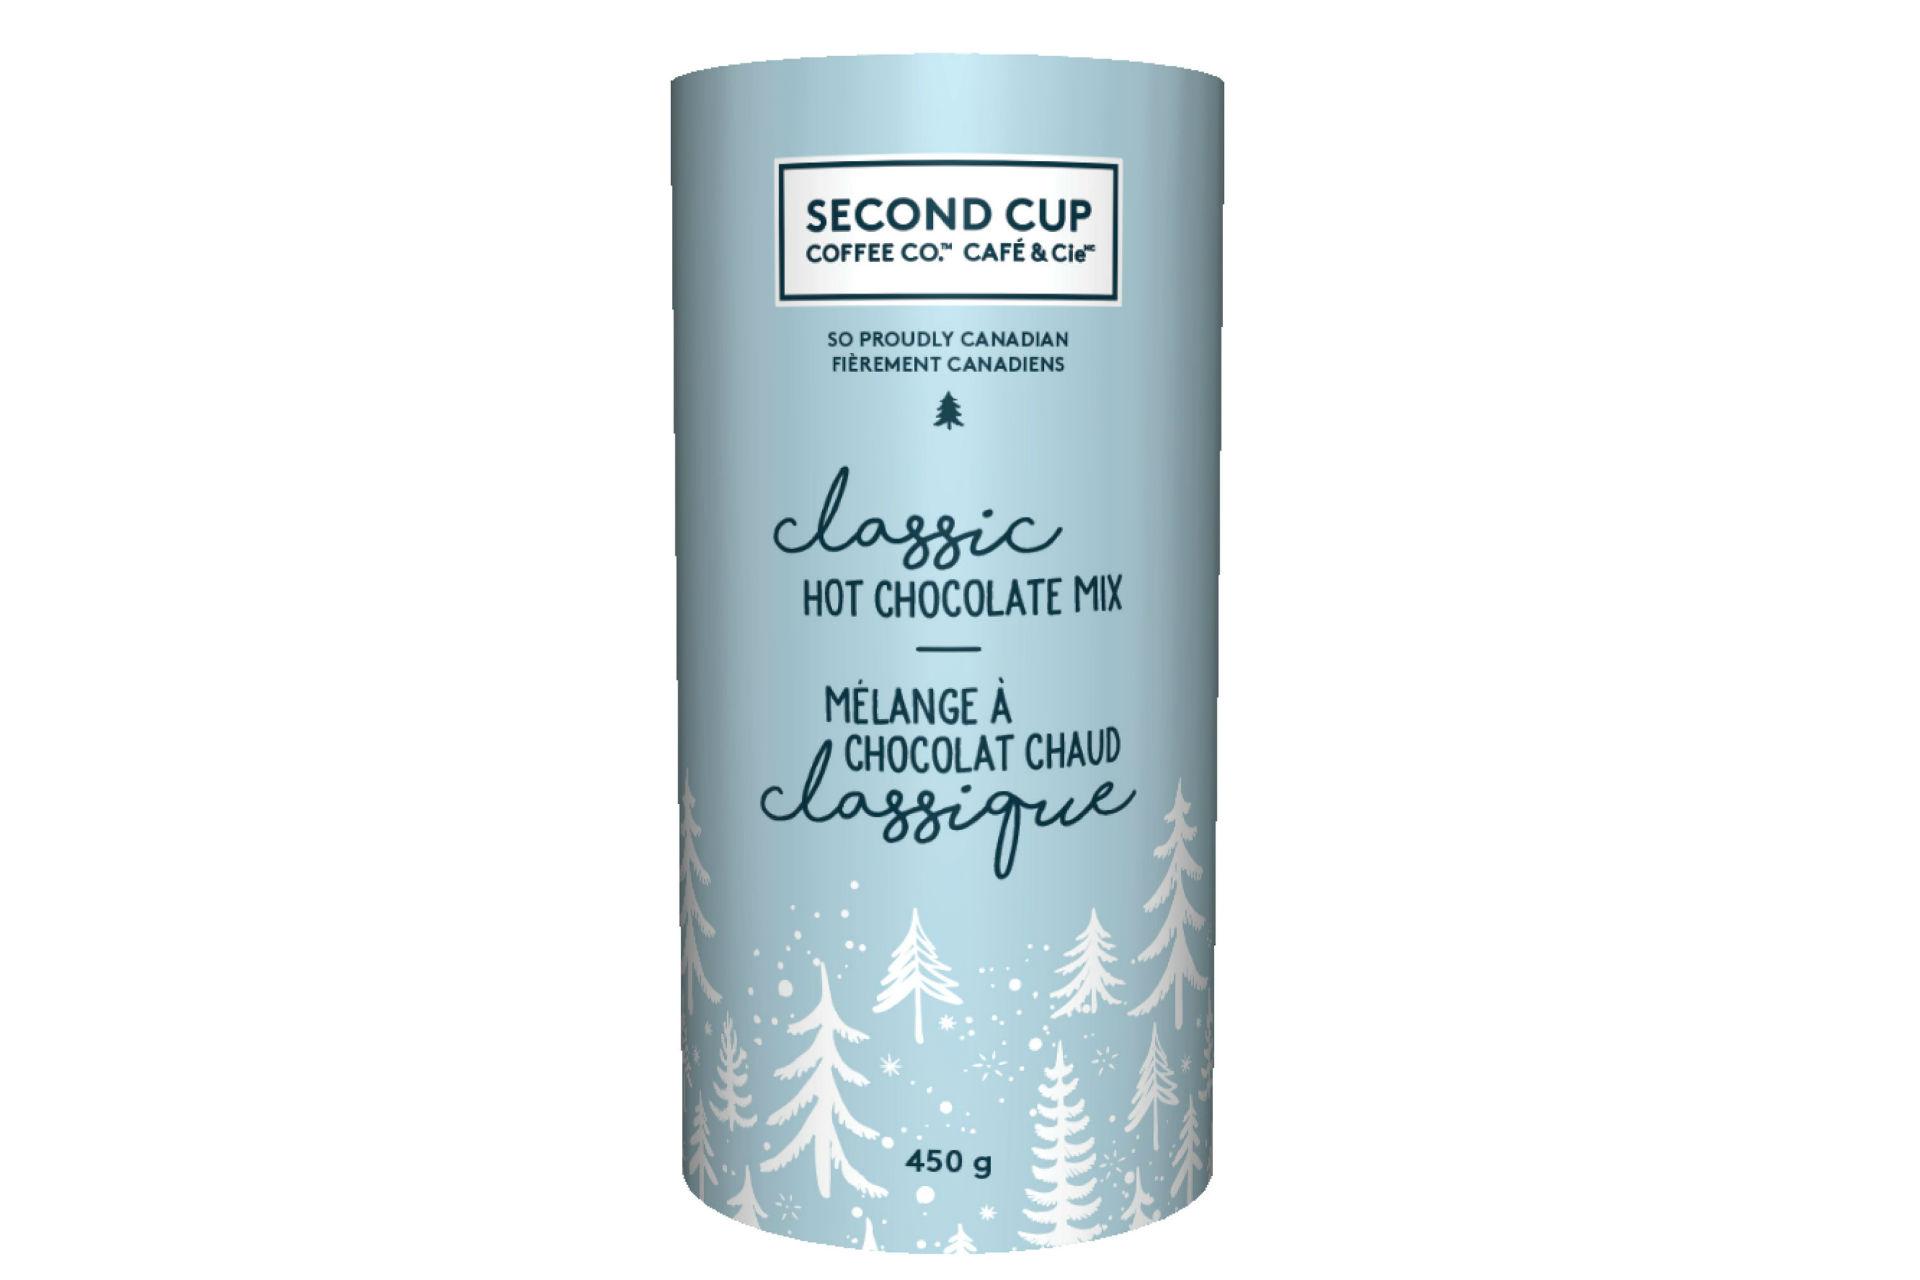 Classic hot chocolate mix